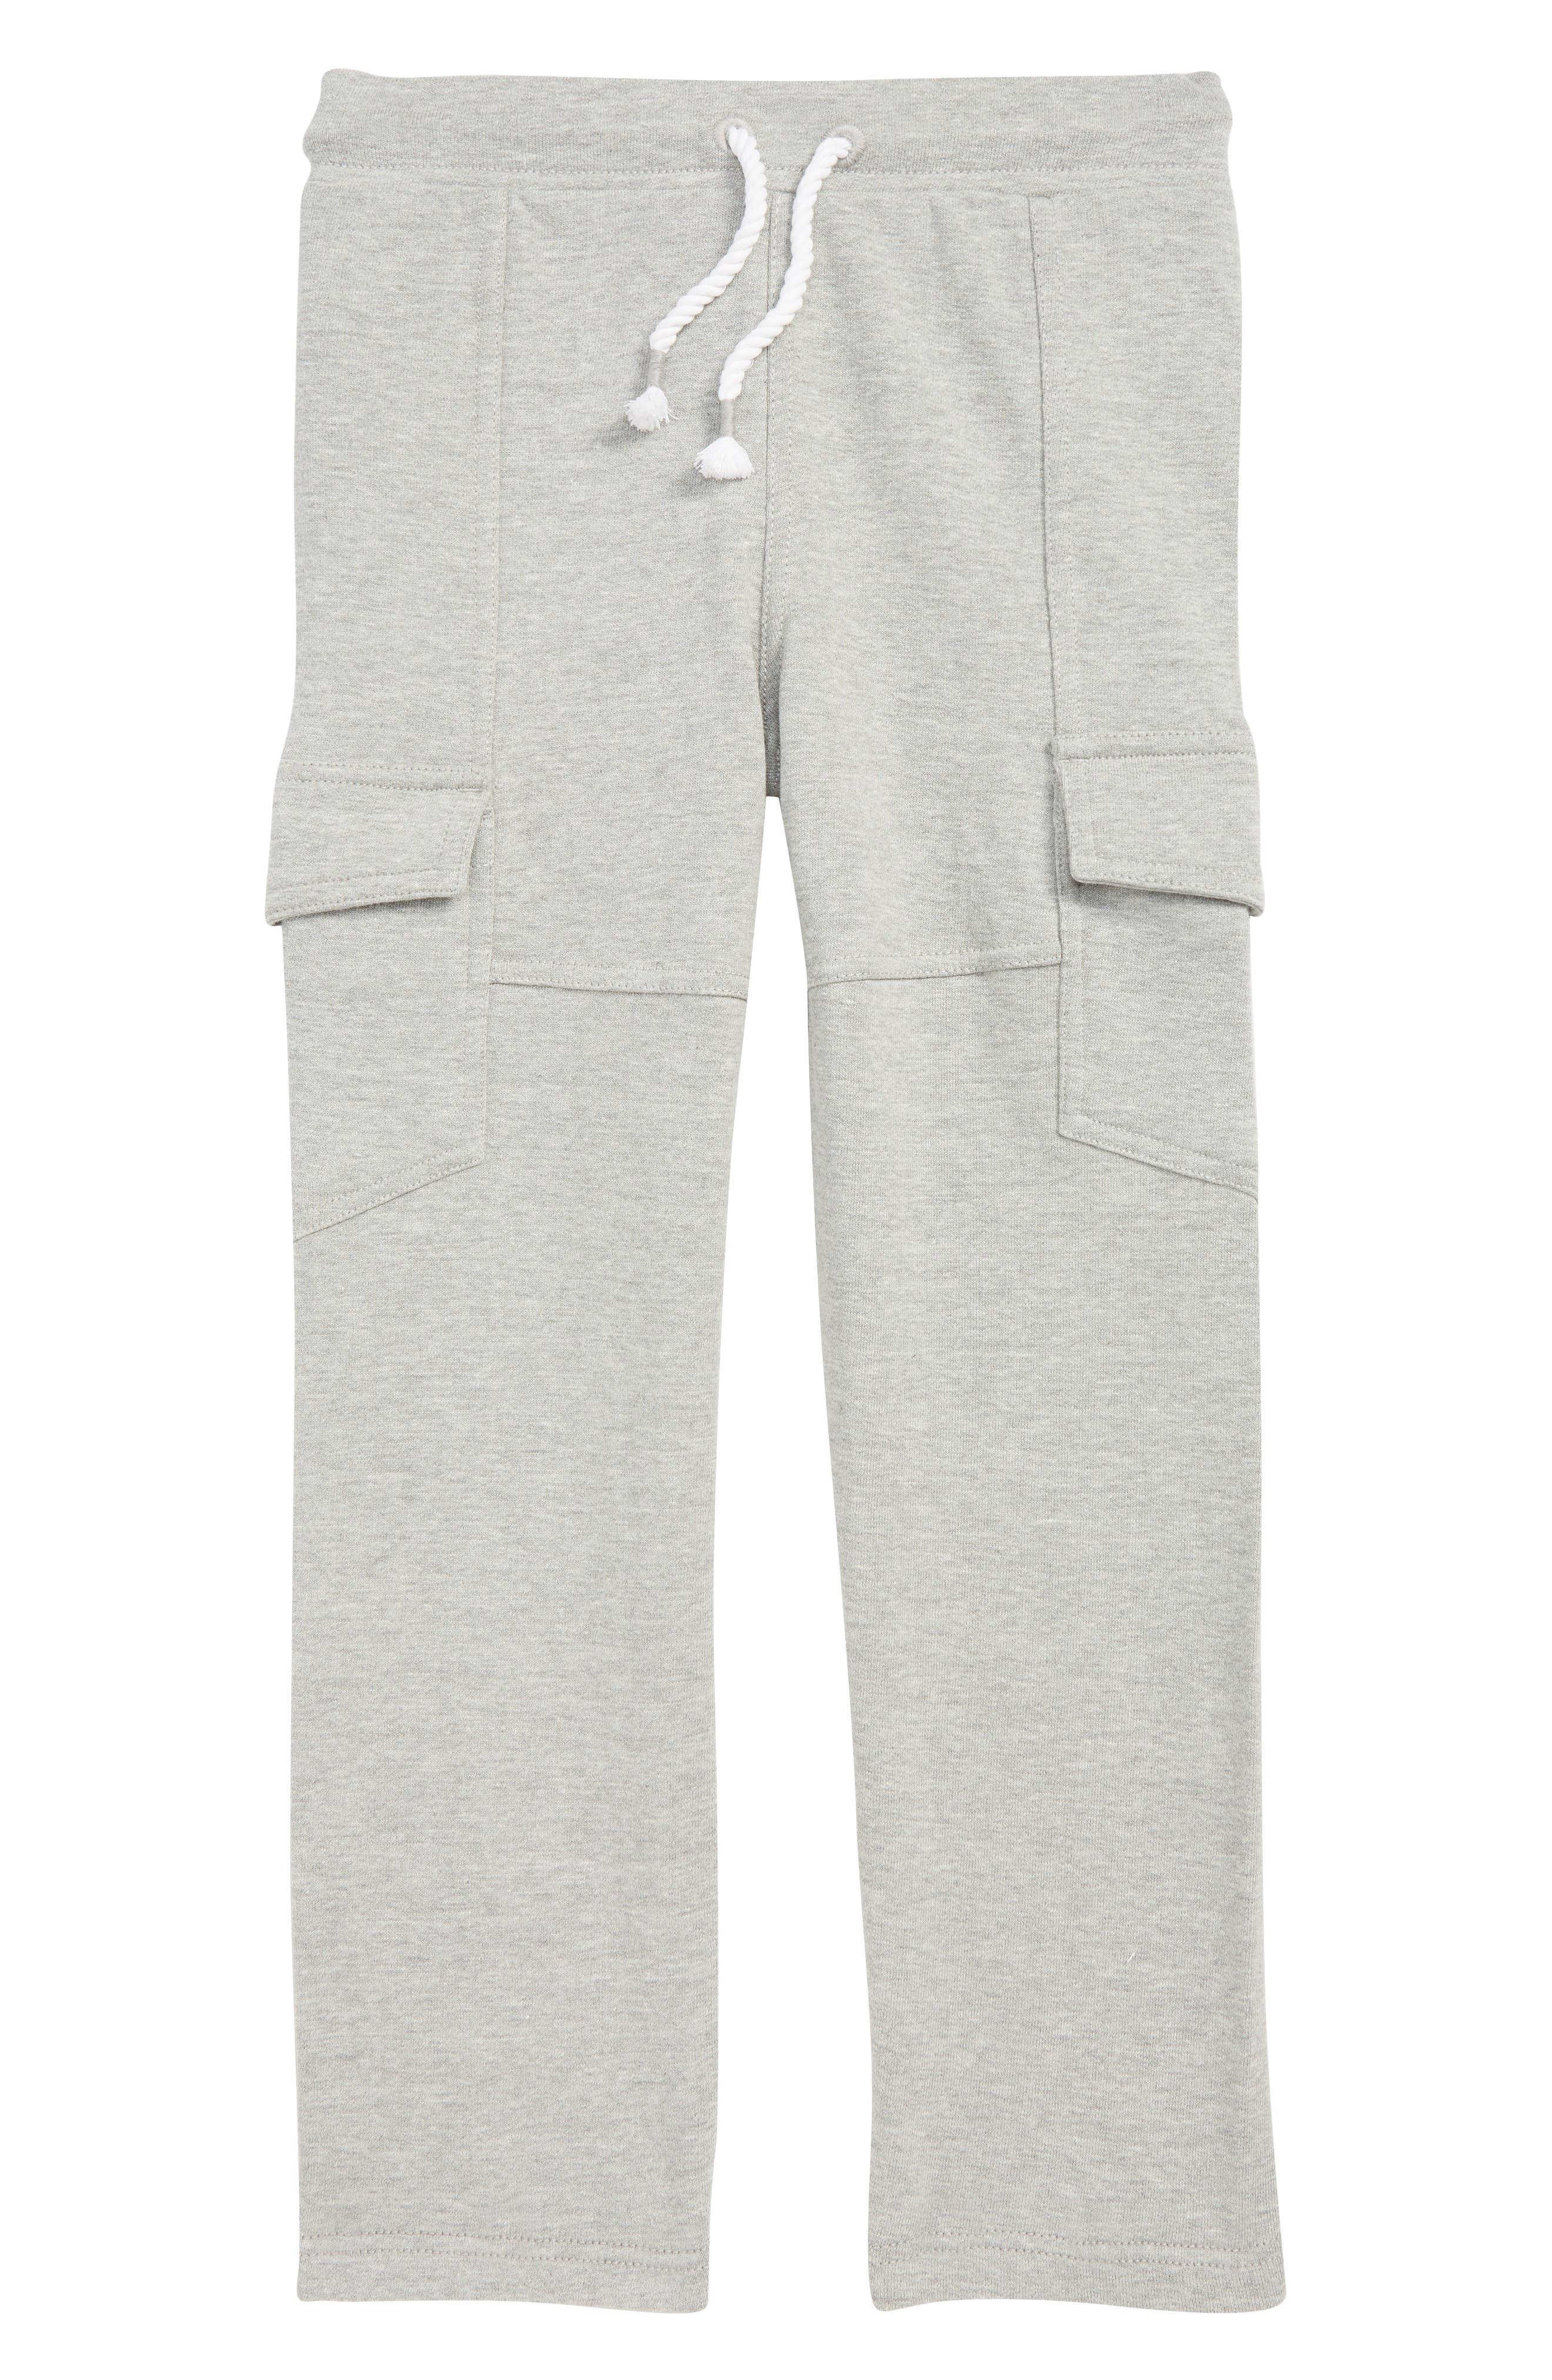 HATLEY Cargo Jogger Pants, Main, color, GREY